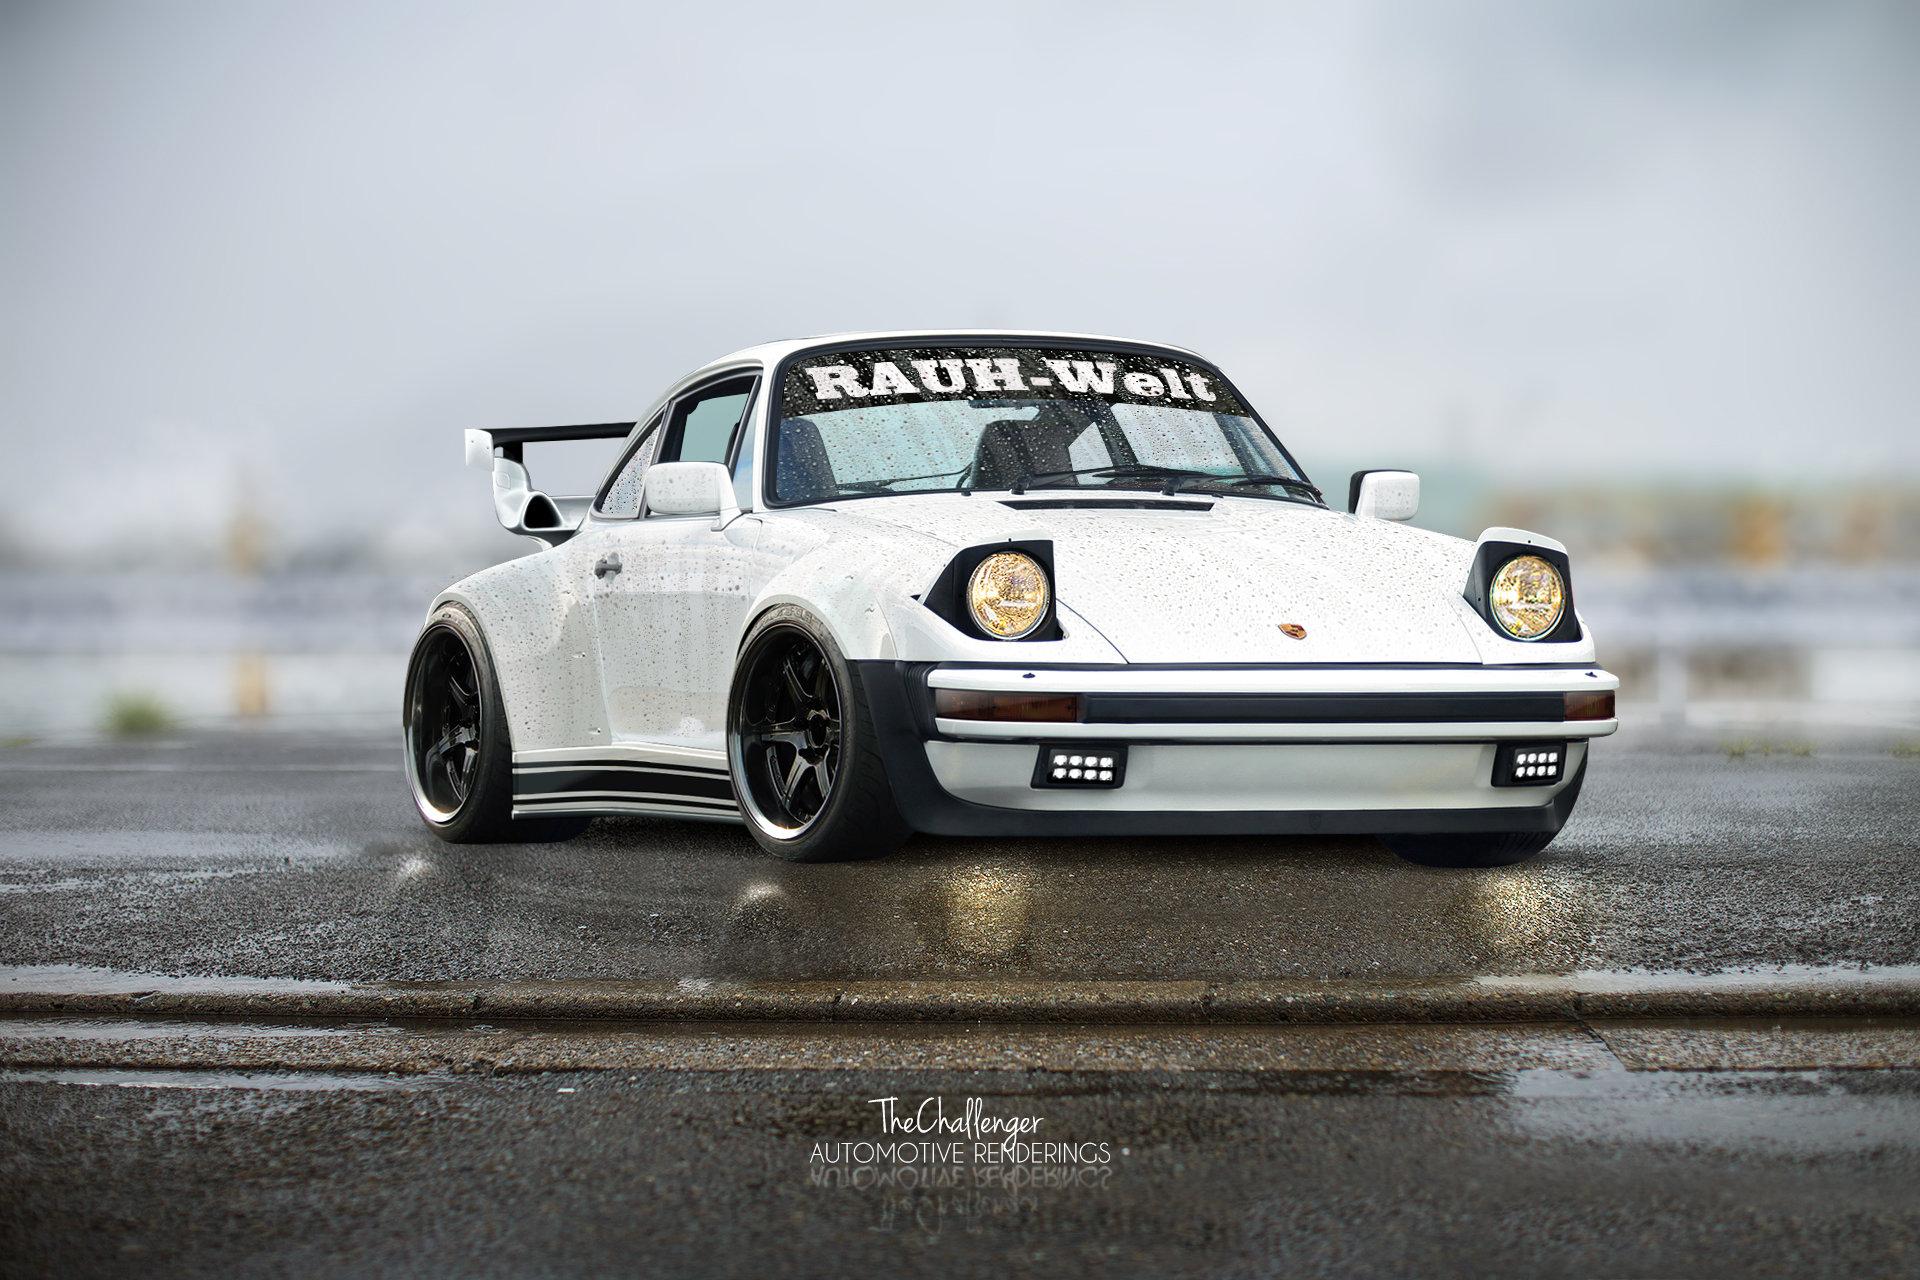 My Other Car Is A Porsche Go4carz Com